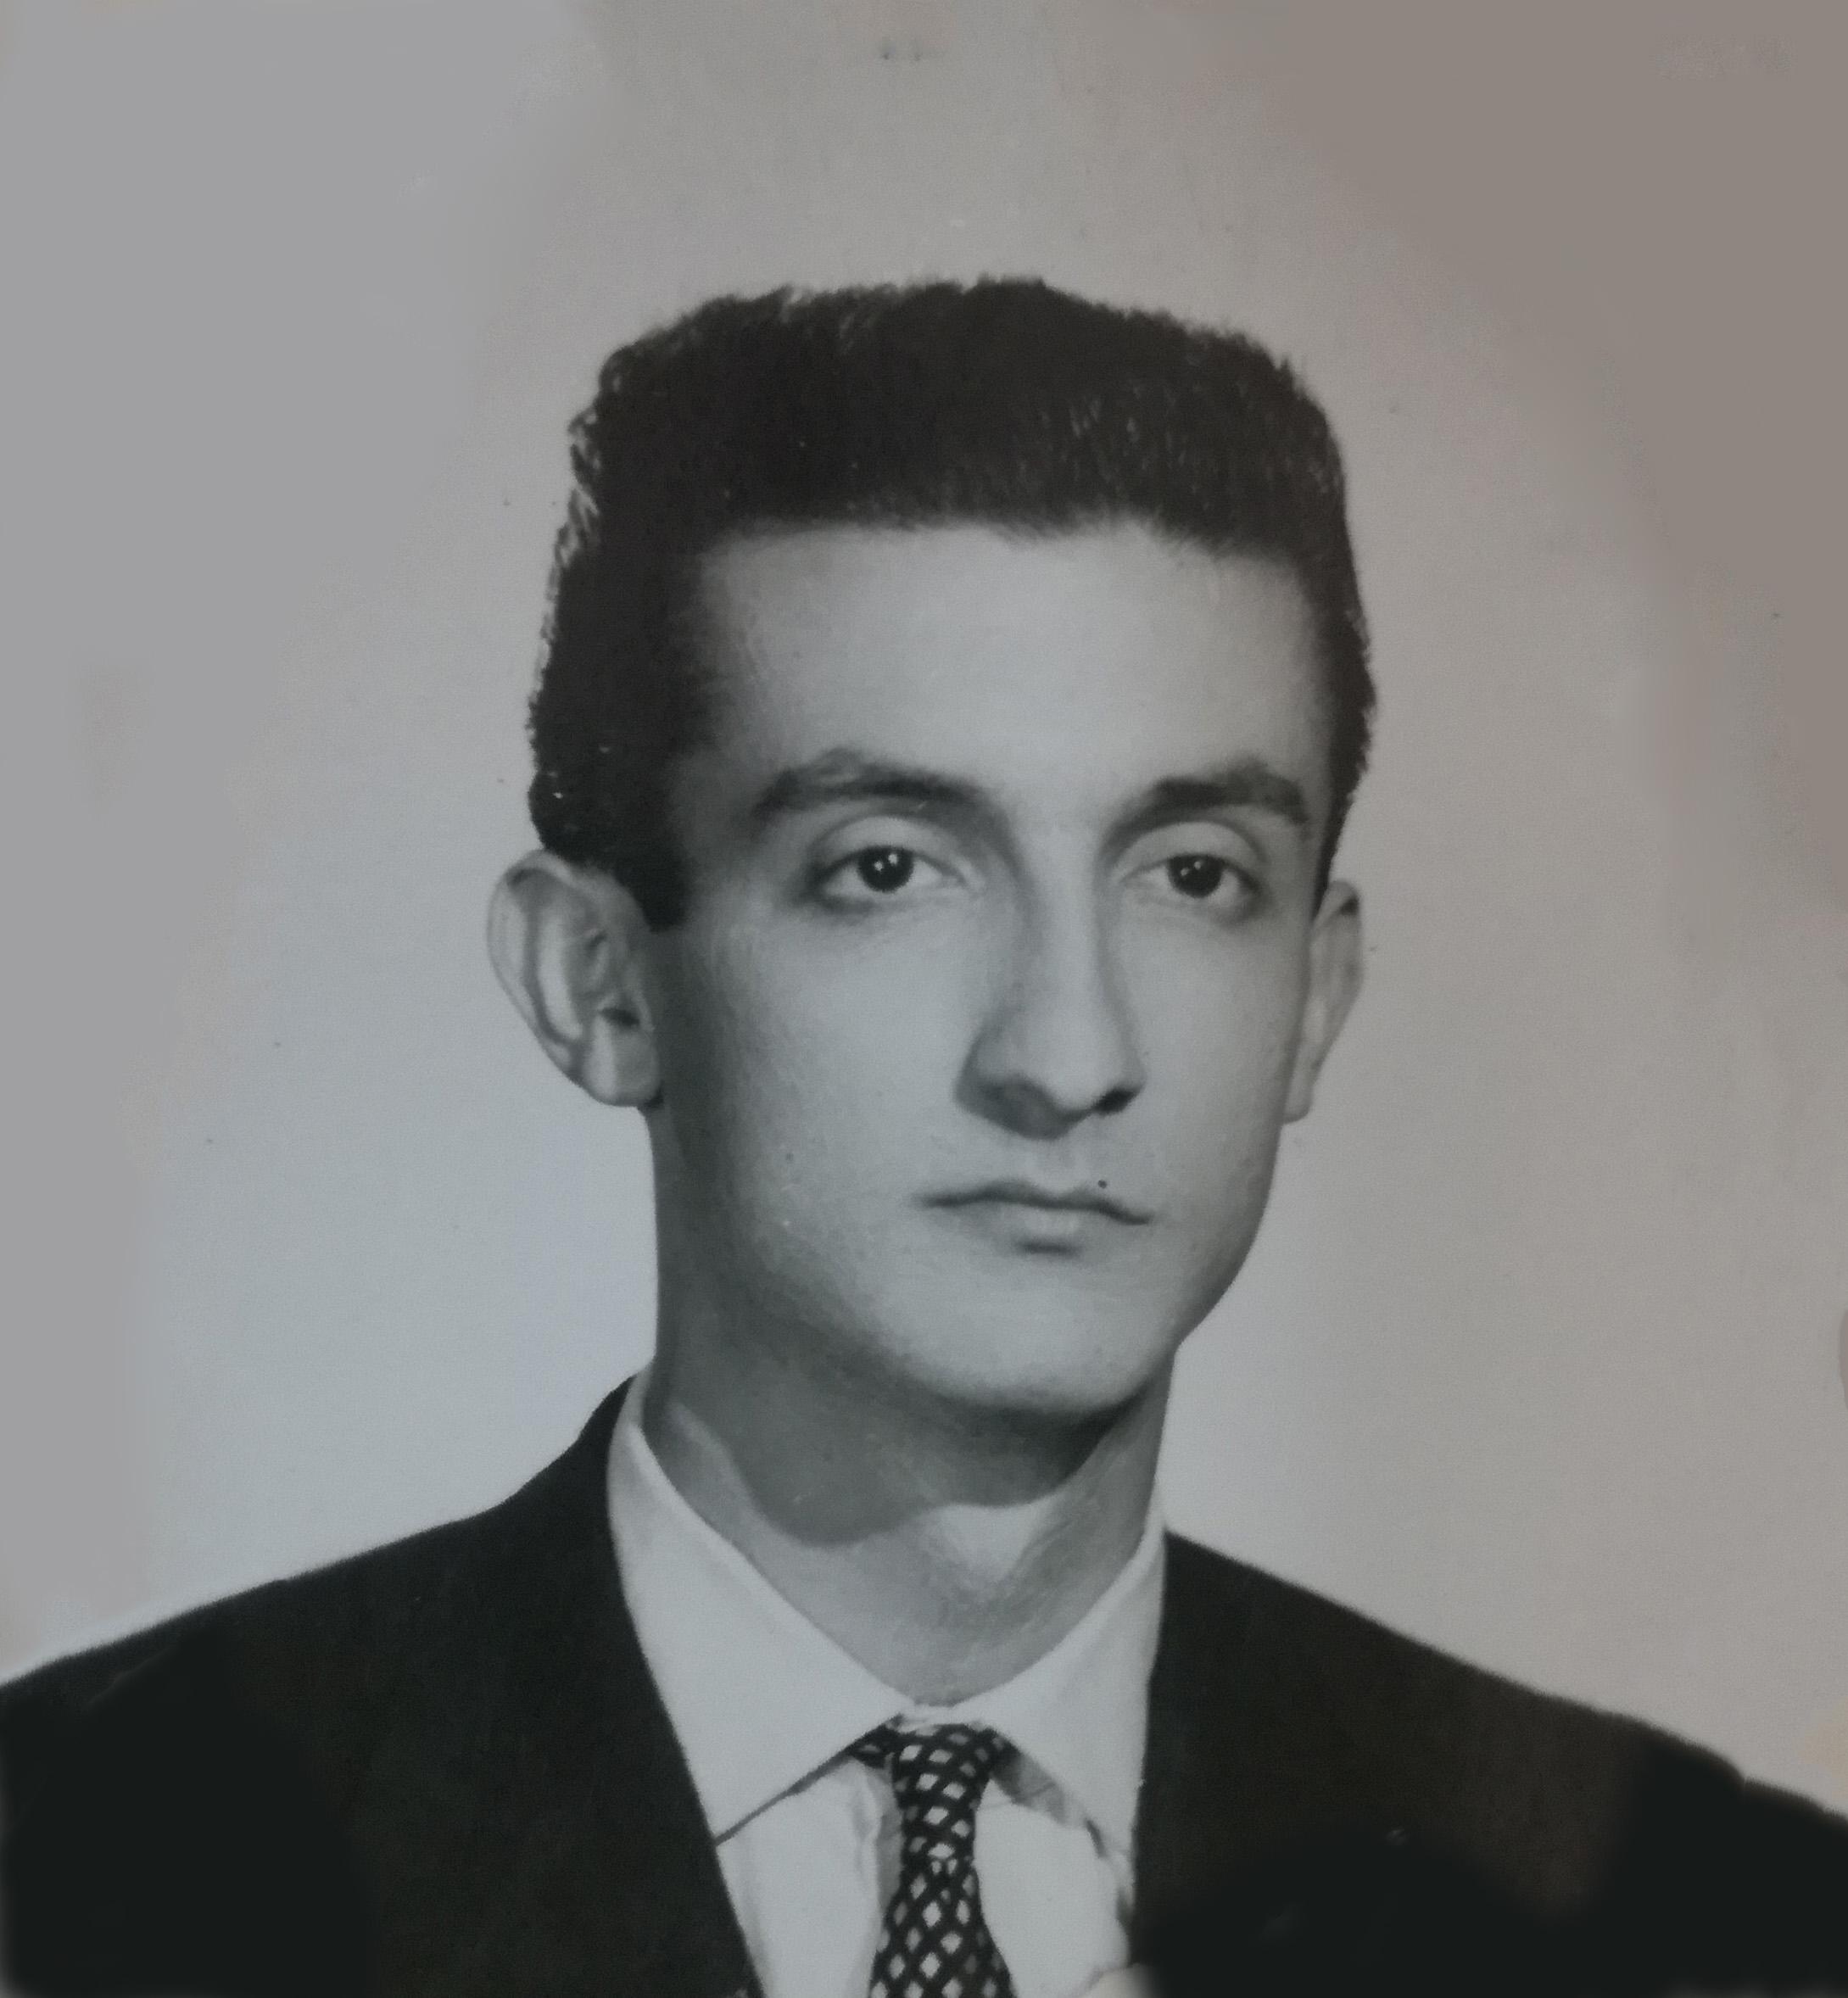 Ángel Casarín